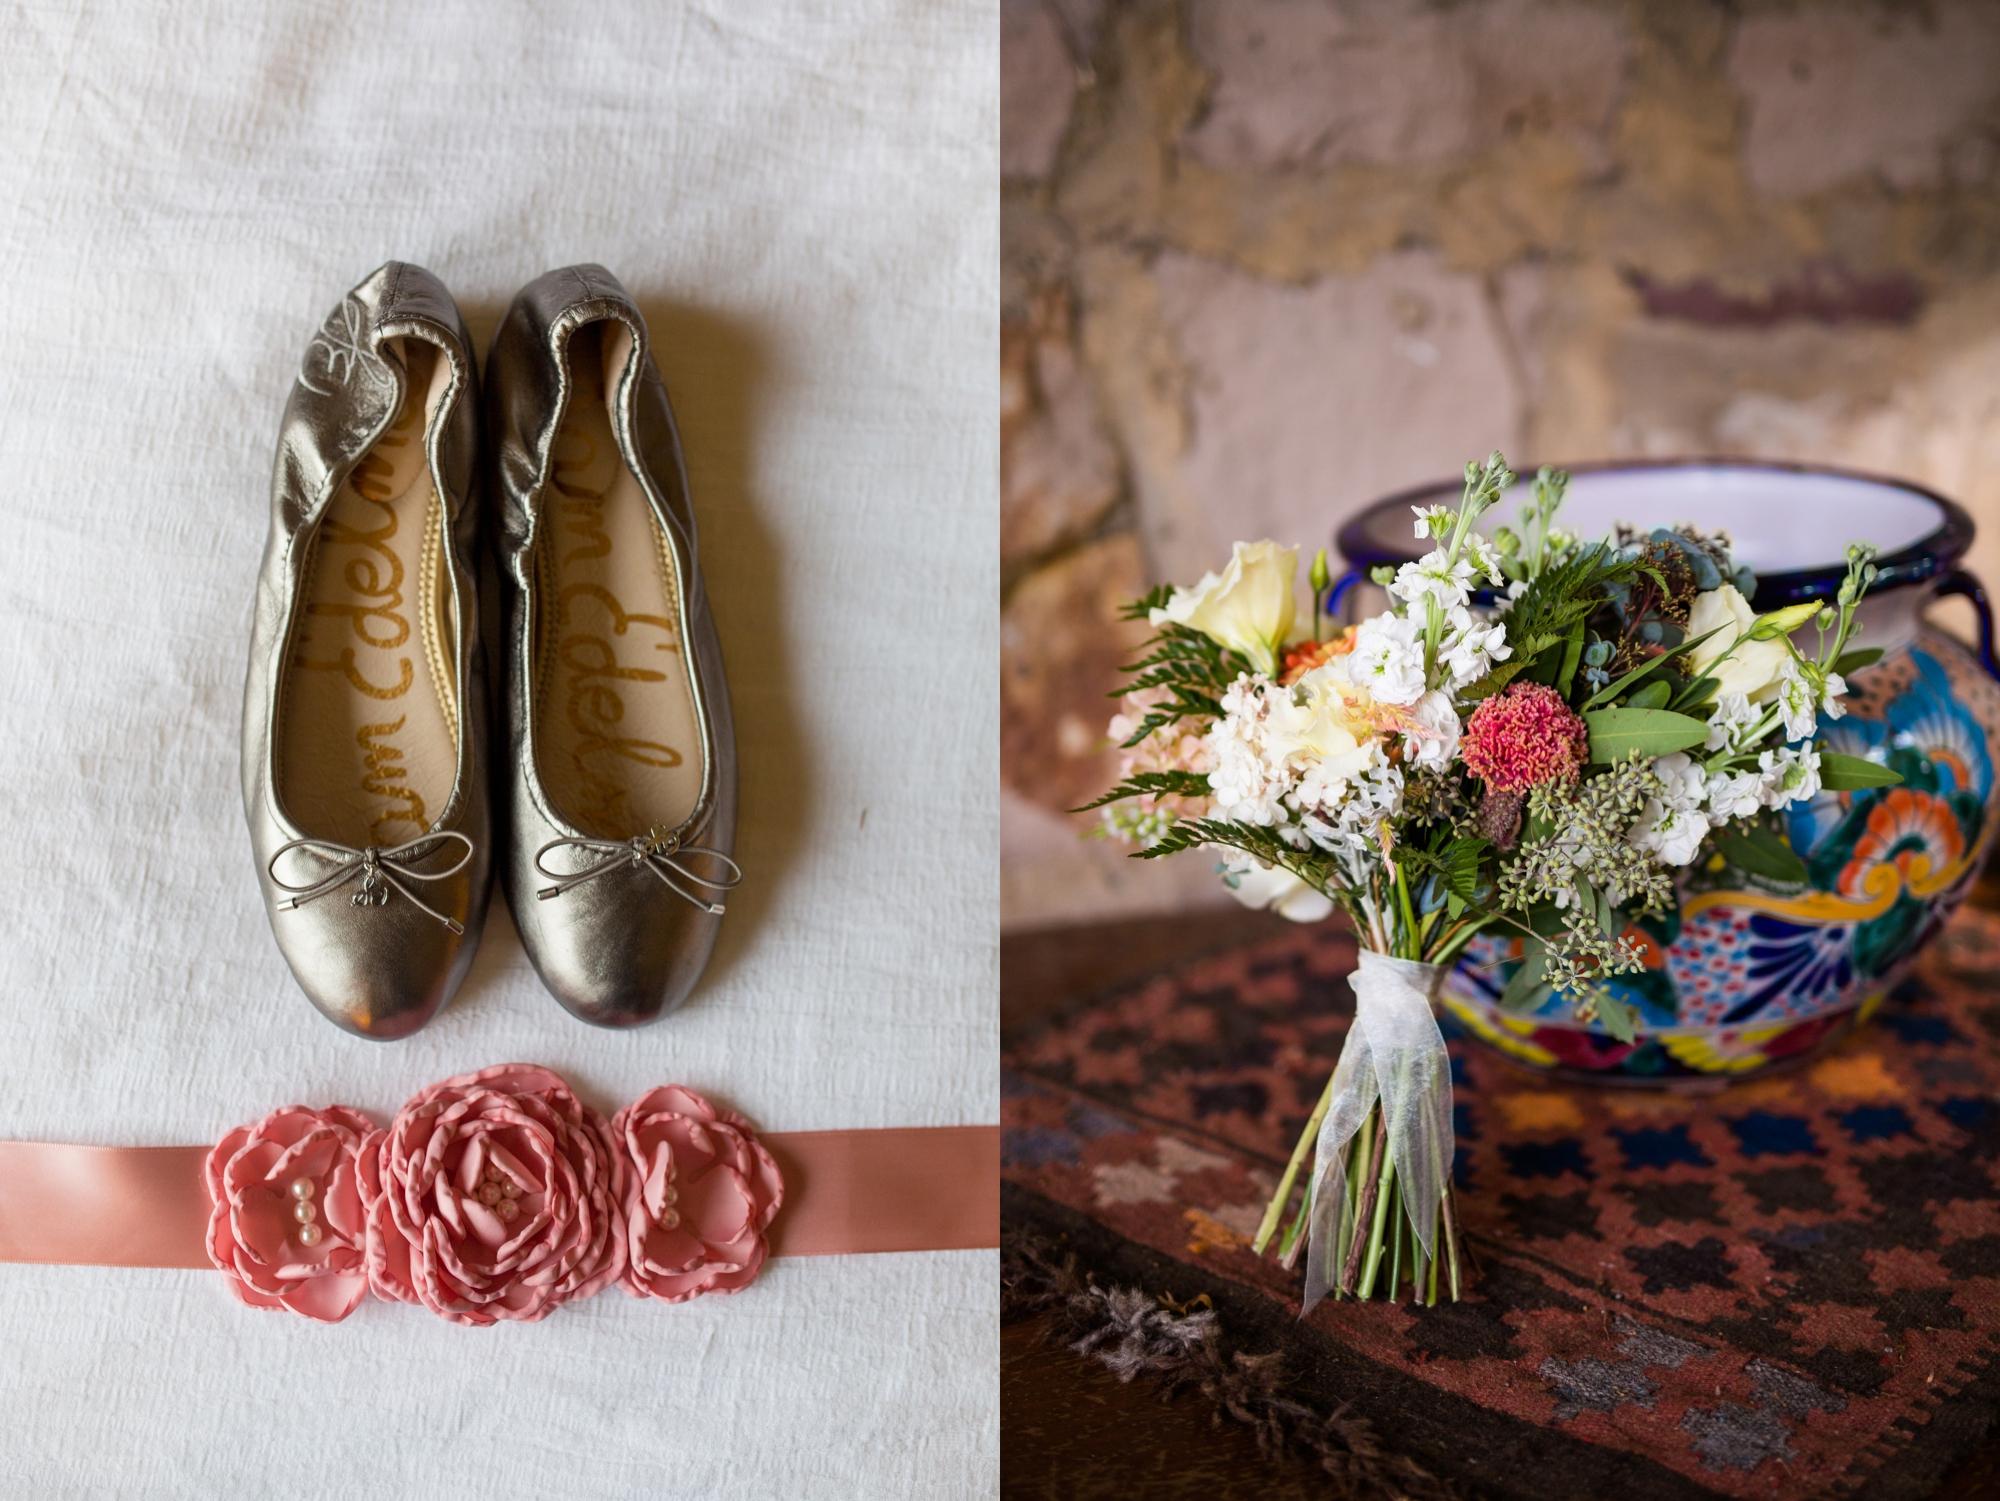 pittsburgh wedding photographer, pittsburgh wedding photographers, pittsburgh wedding venue, pittsburgh wedding venues, cranberry township photographer, zelienople photographer, bridal details